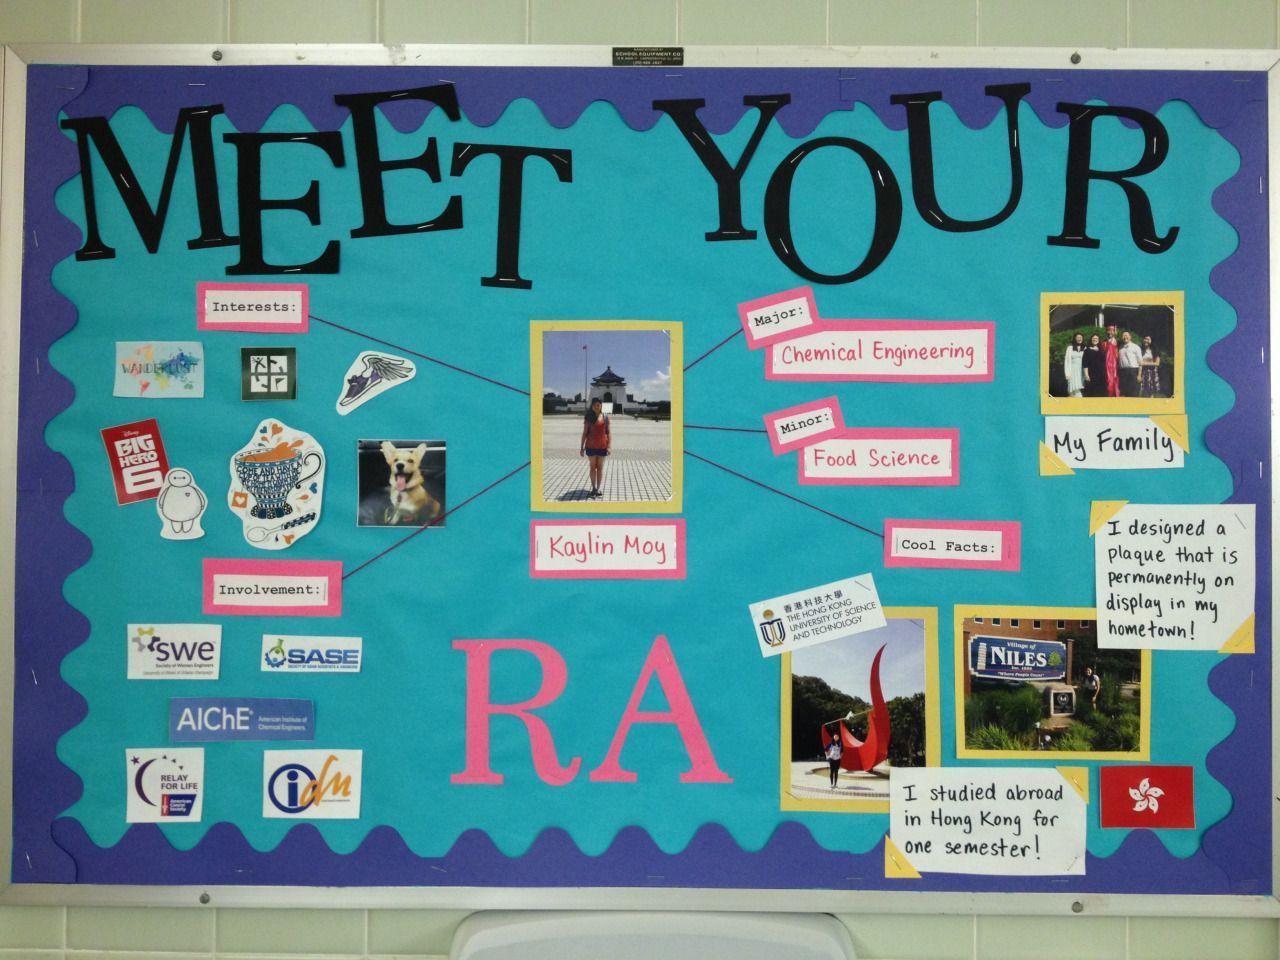 Meet your RA bulletin board! #RA #ResLife #rabulletinboards Meet your RA bulletin board! #RA #ResLife #rabulletinboards Meet your RA bulletin board! #RA #ResLife #rabulletinboards Meet your RA bulletin board! #RA #ResLife #rabulletinboards